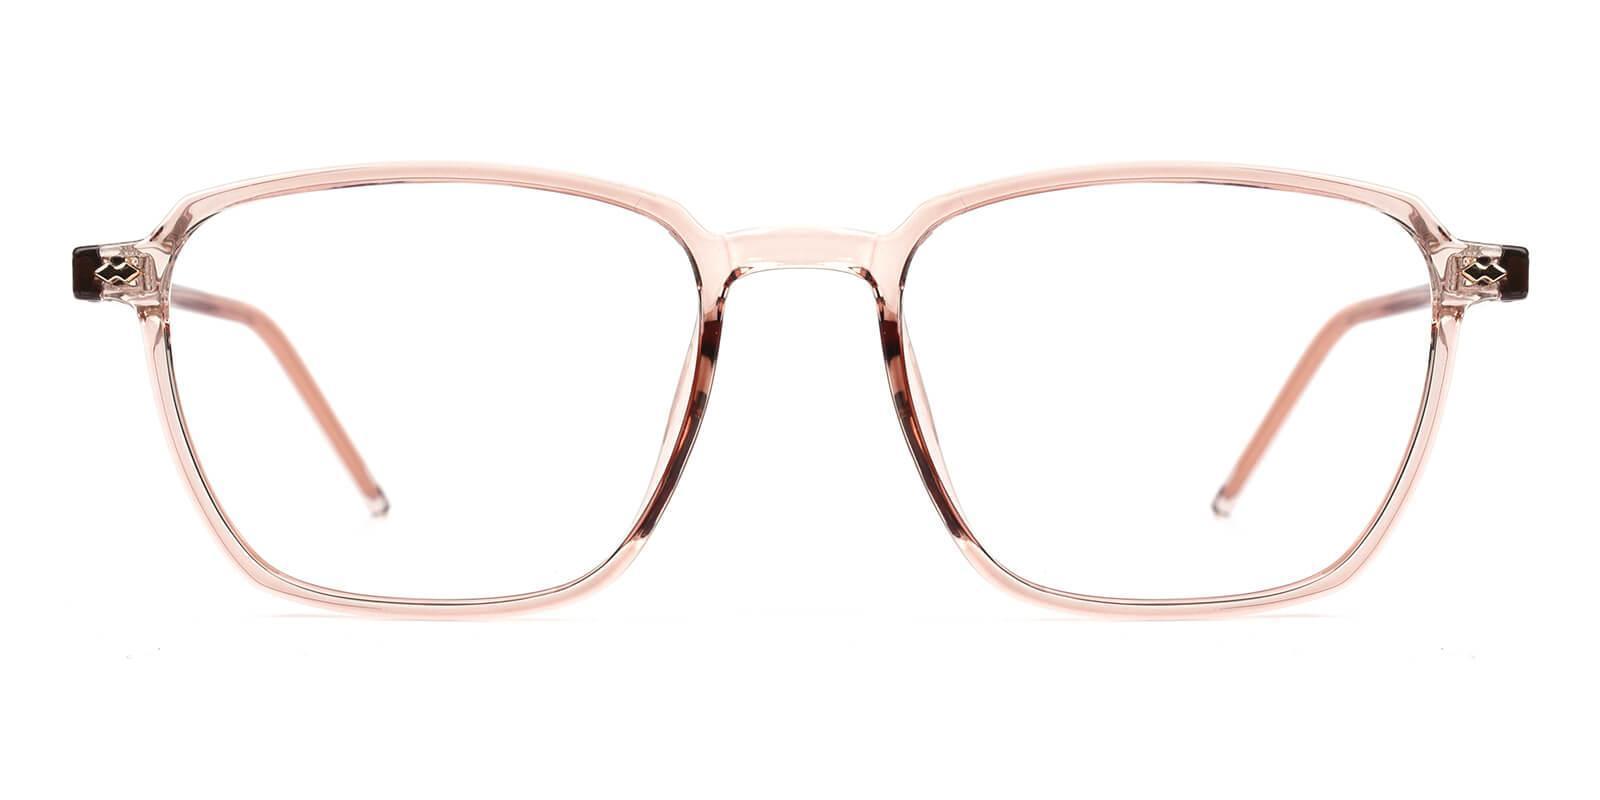 Flume Pink TR Eyeglasses , SpringHinges , UniversalBridgeFit Frames from ABBE Glasses